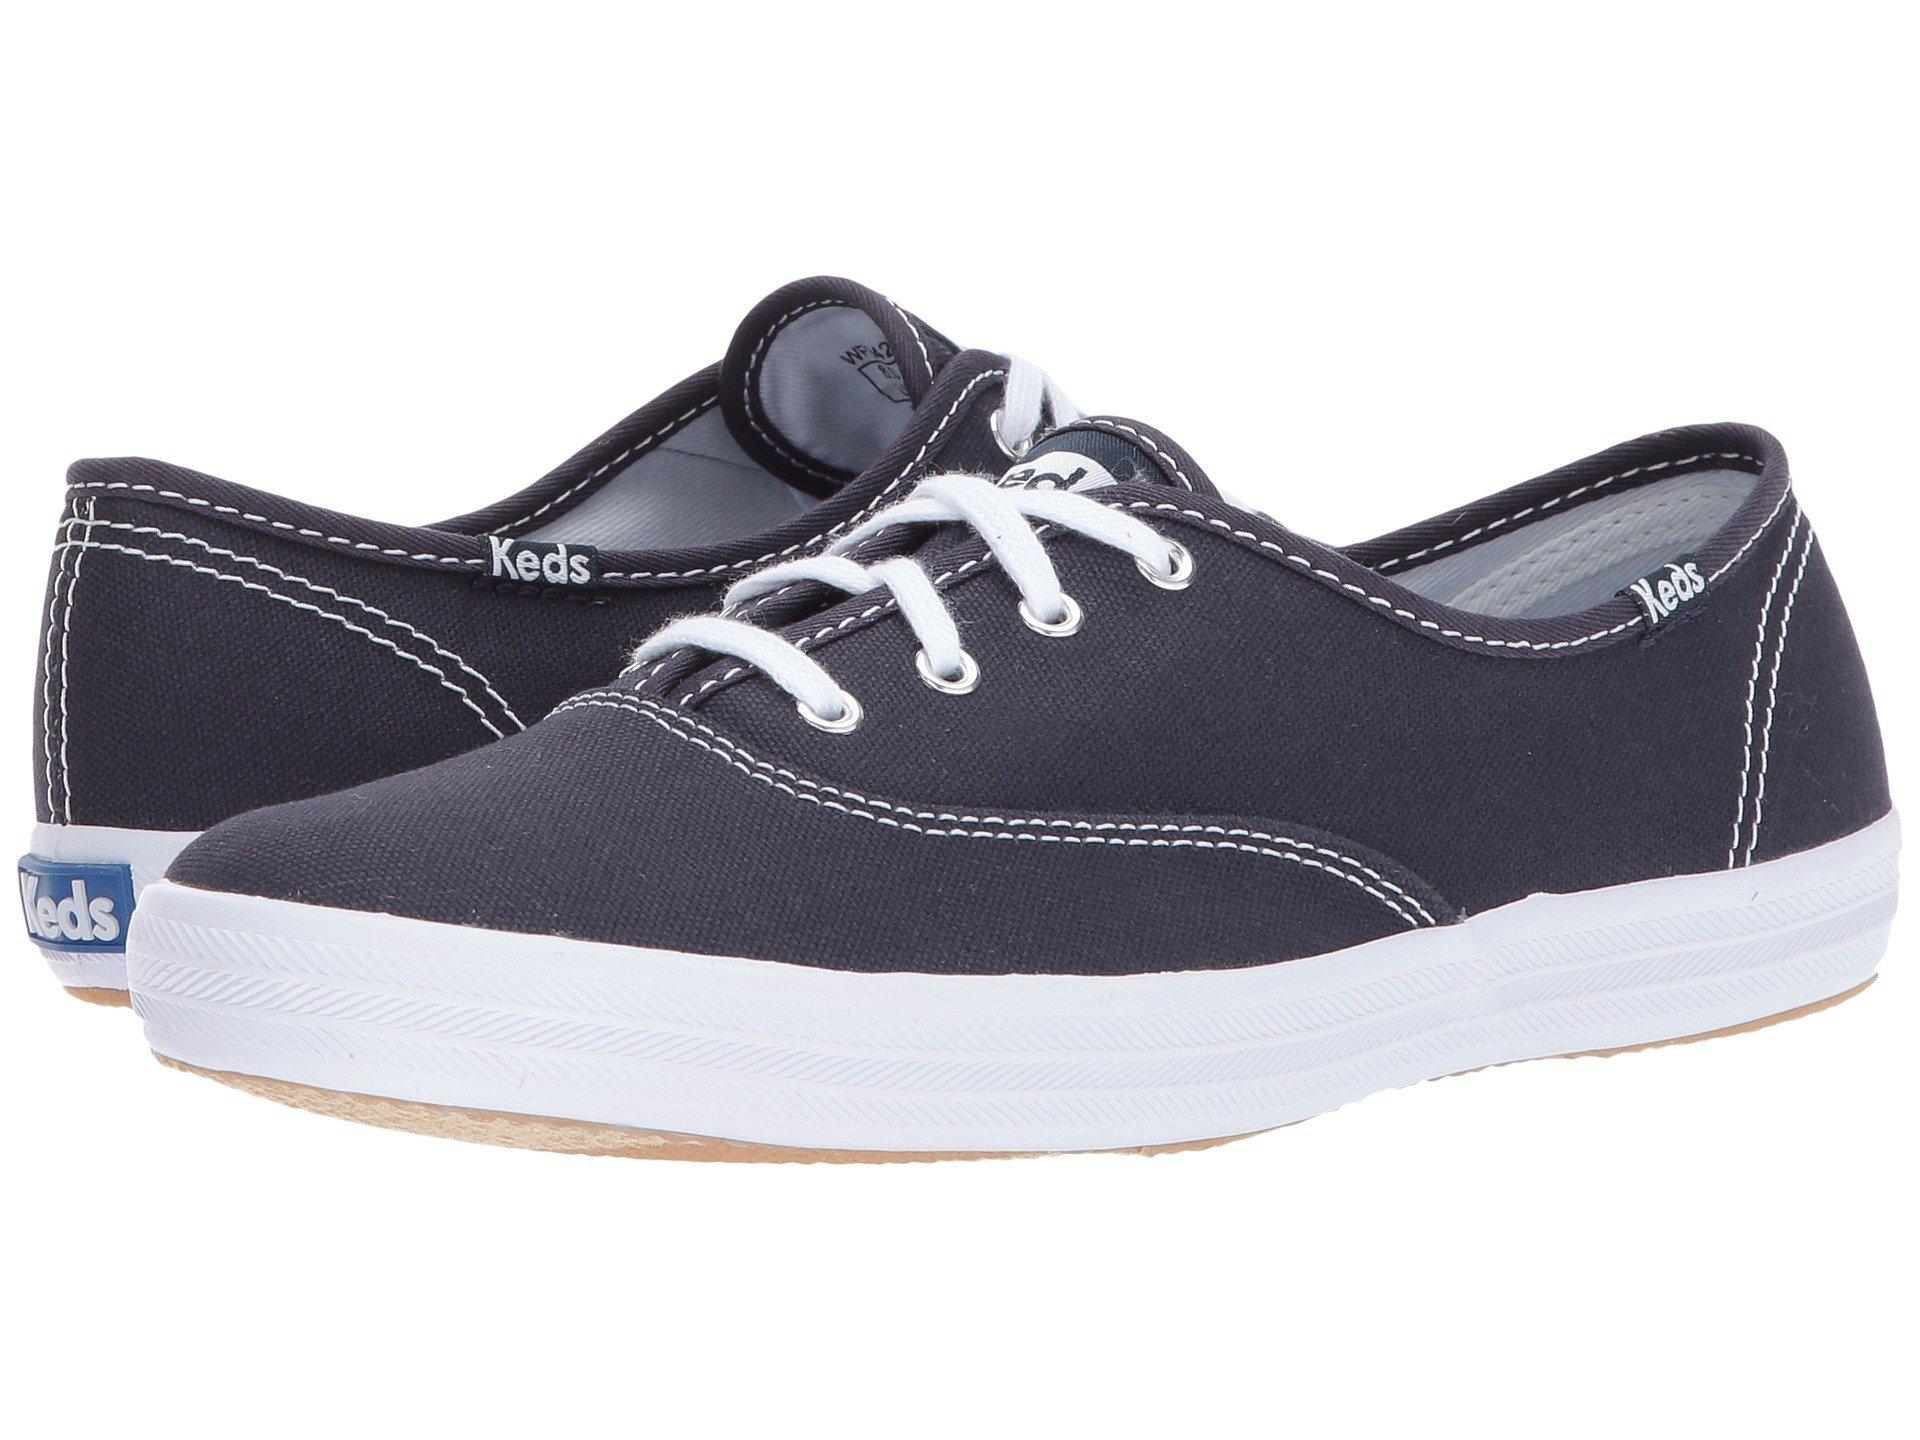 separation shoes ef199 52eea Keds Women's Champion Original Canvas Sneaker (39 M EU/8 B(M) US, Navy)